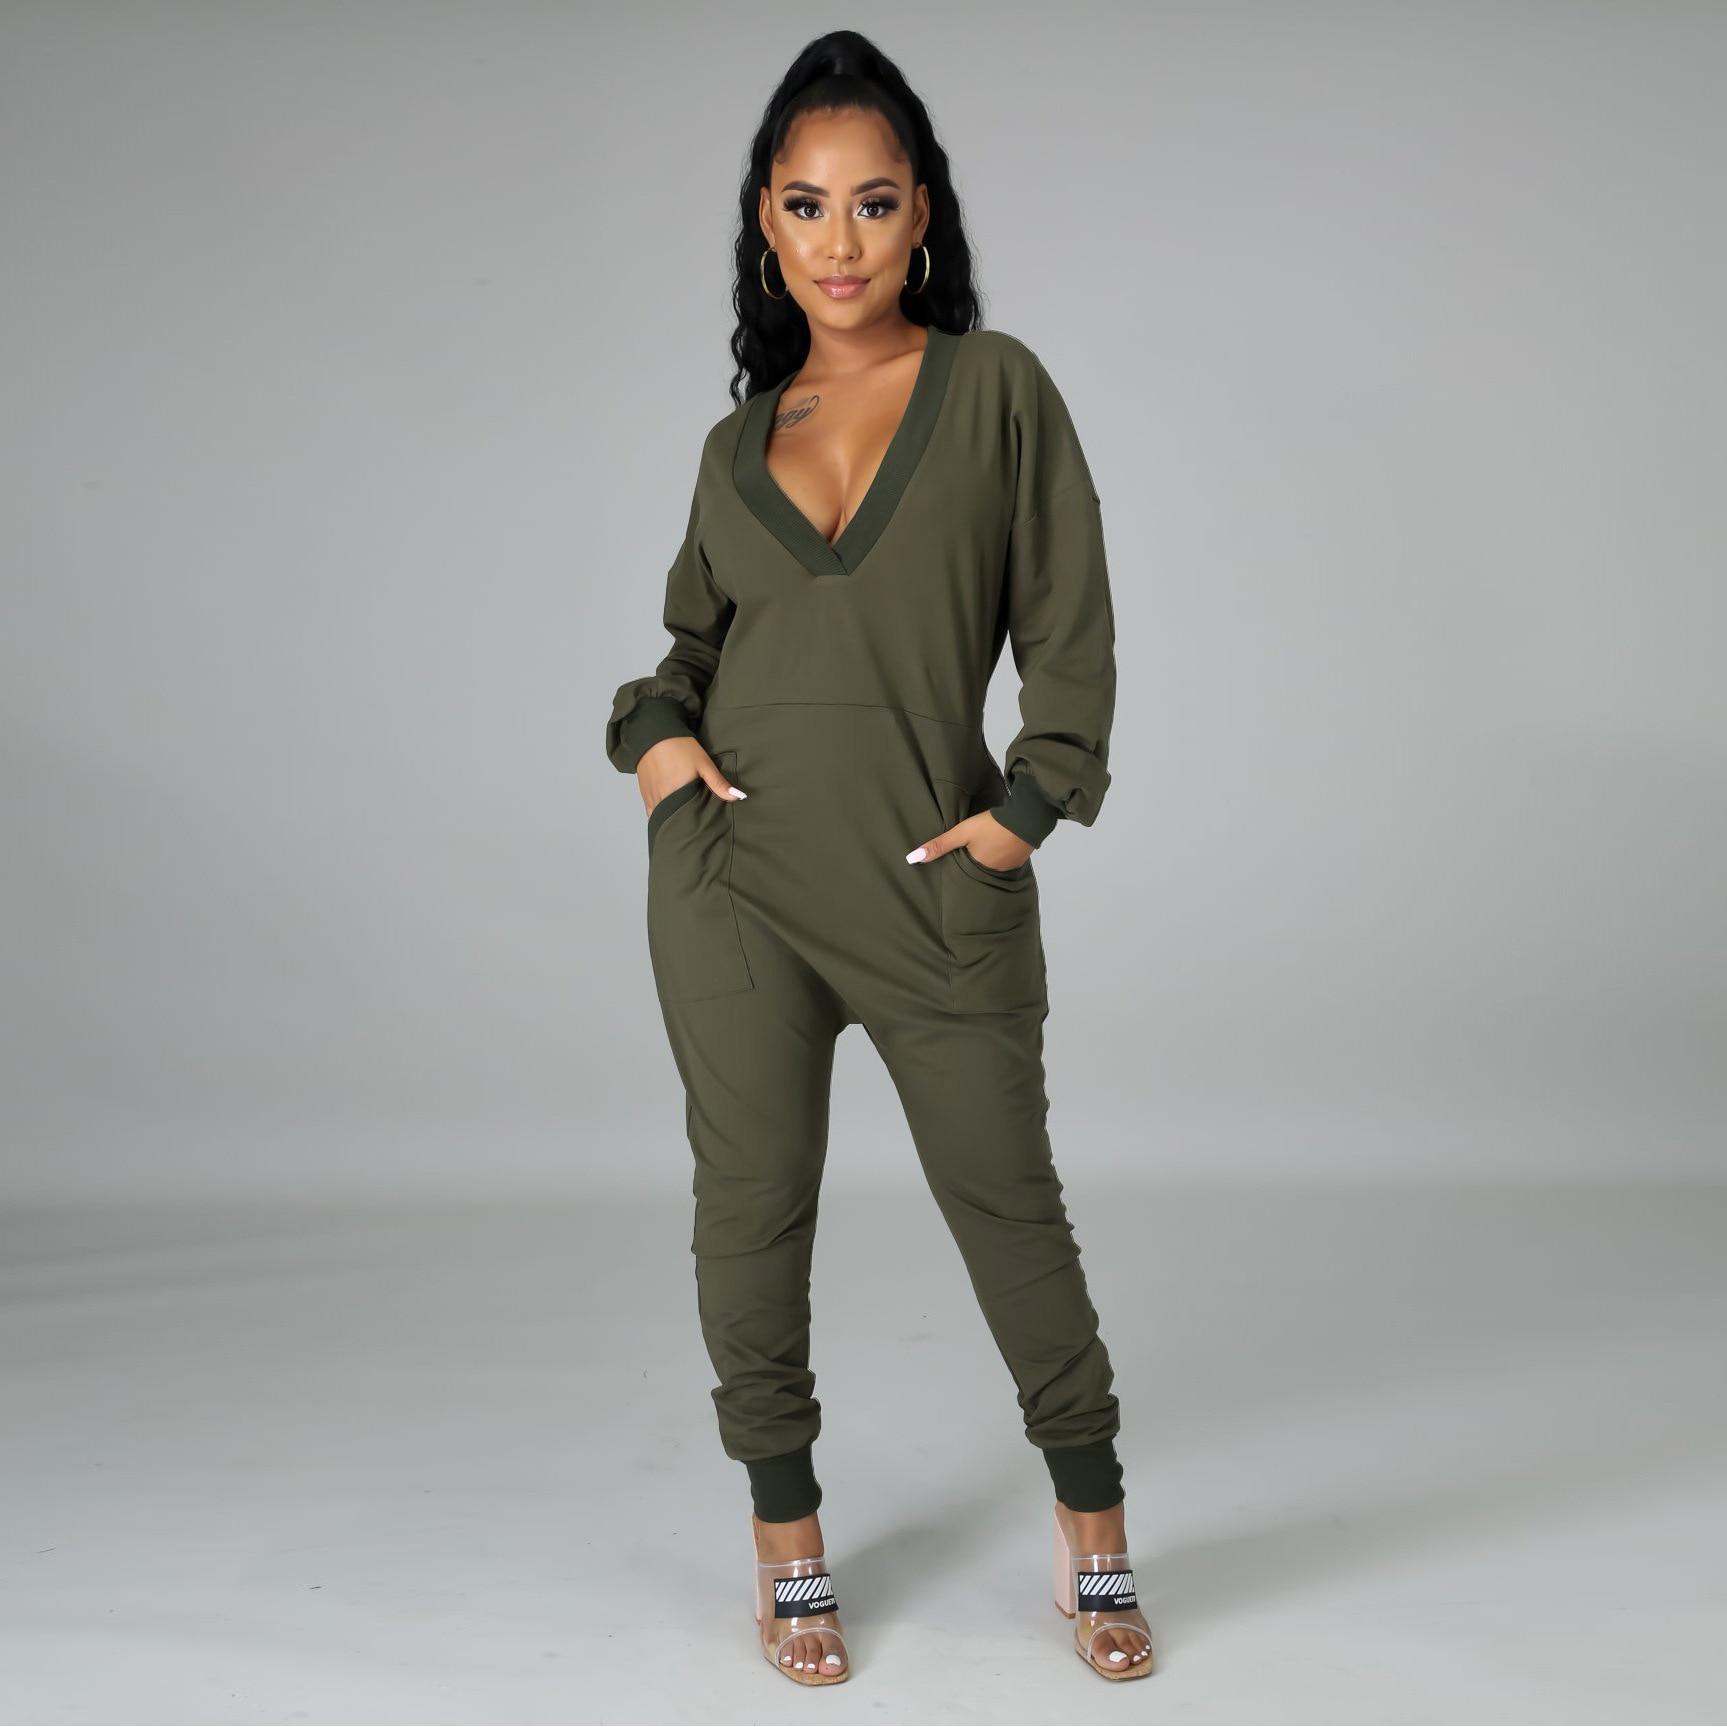 Ursuper New Fashion Jumpsuit Casual V Neck Pocket Design Green Plus Size One-piece Jumpsuit